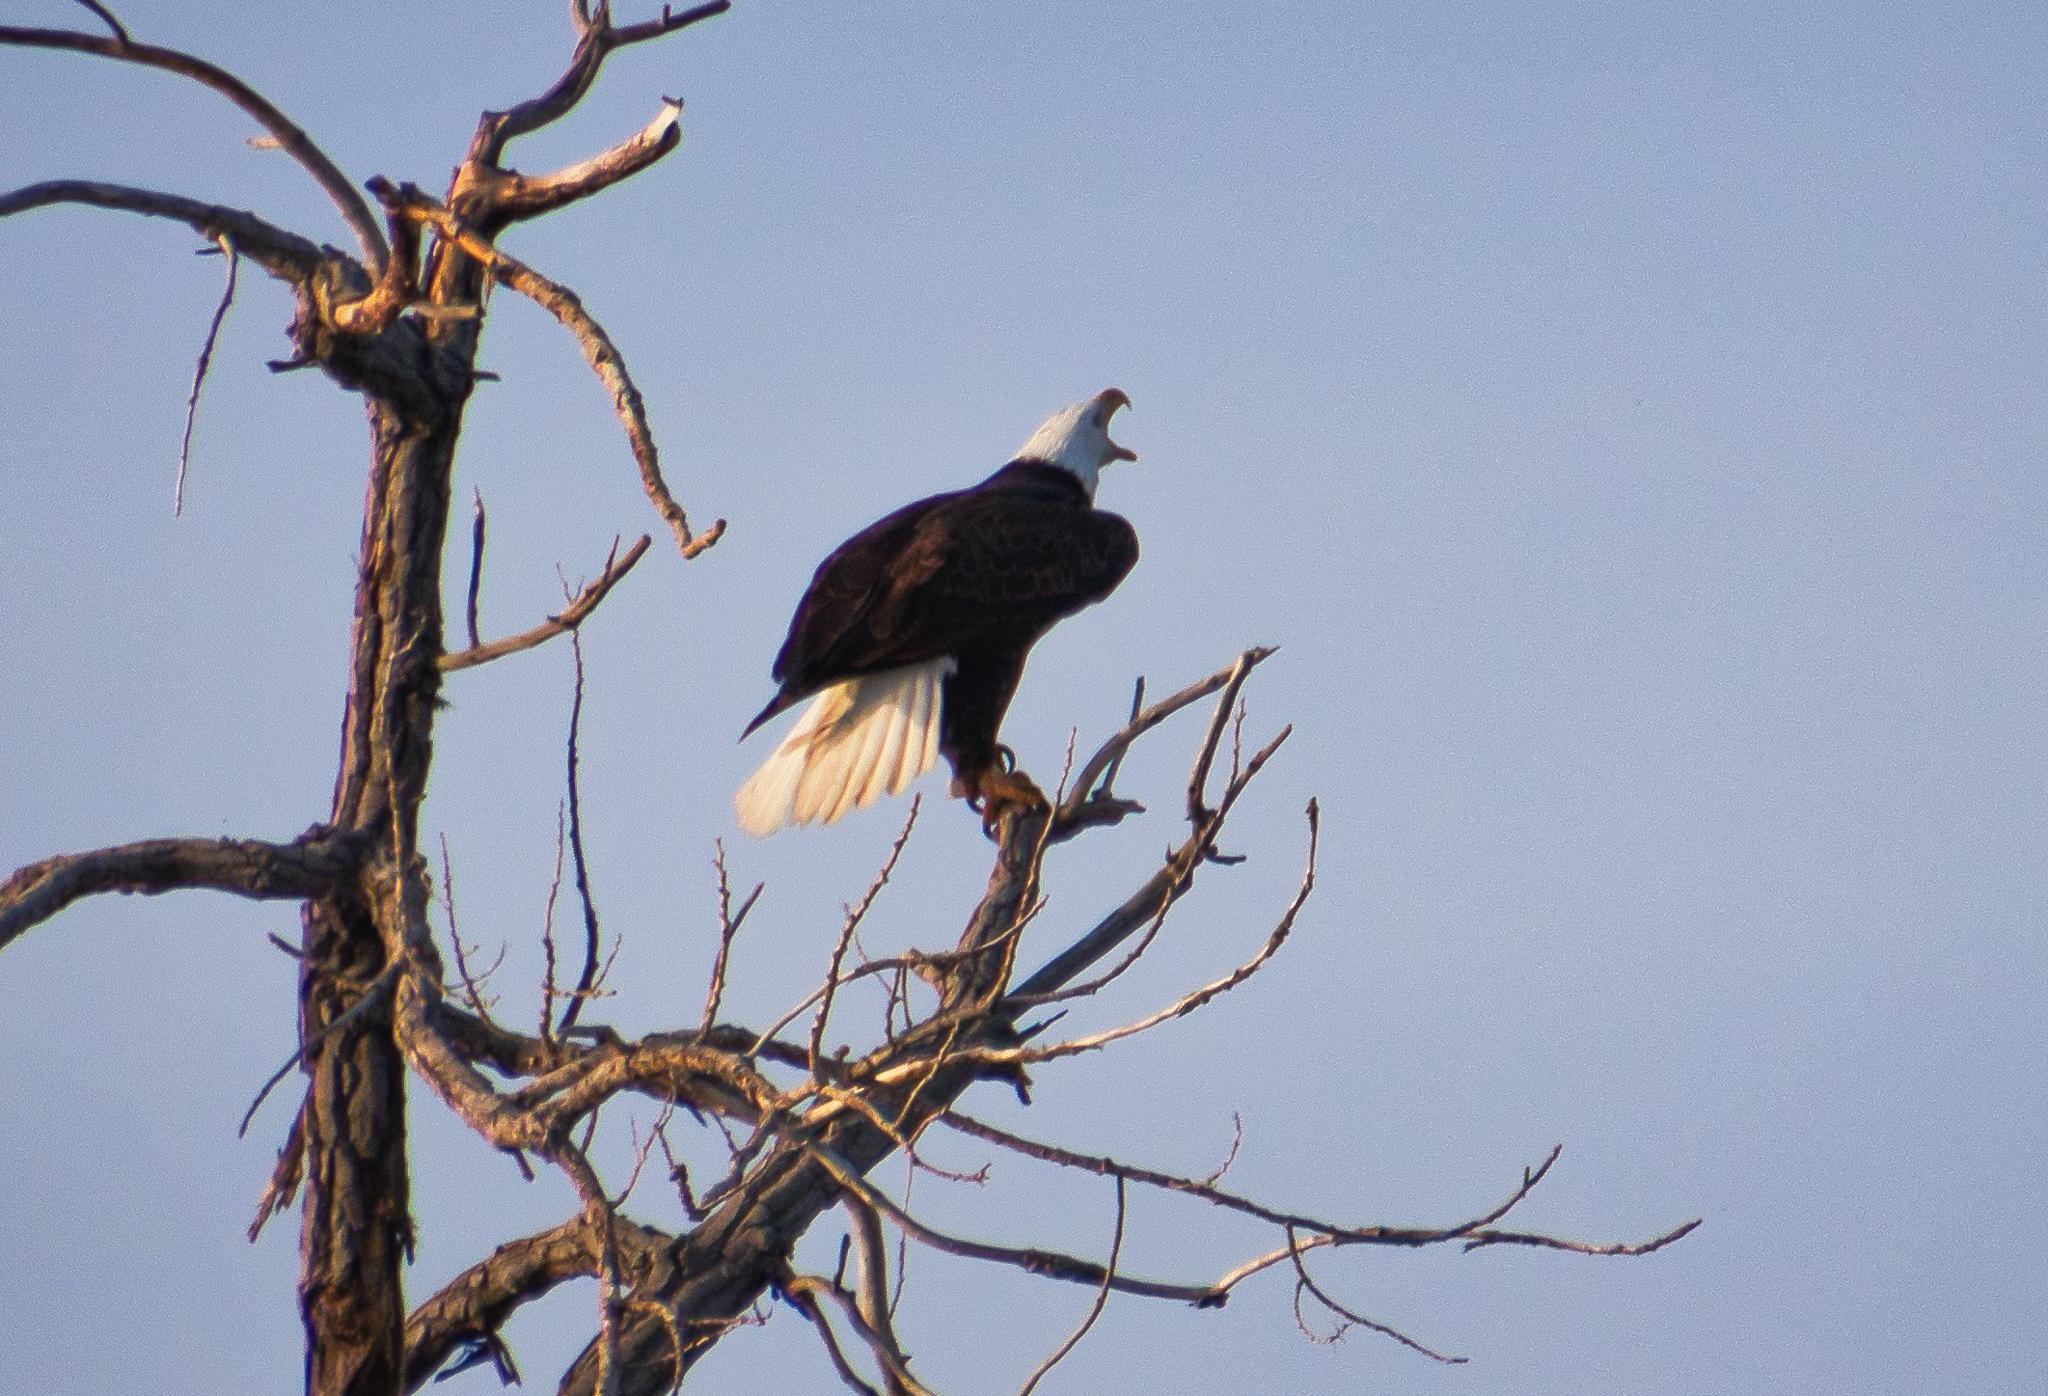 Adult Bald Eagle Screeching